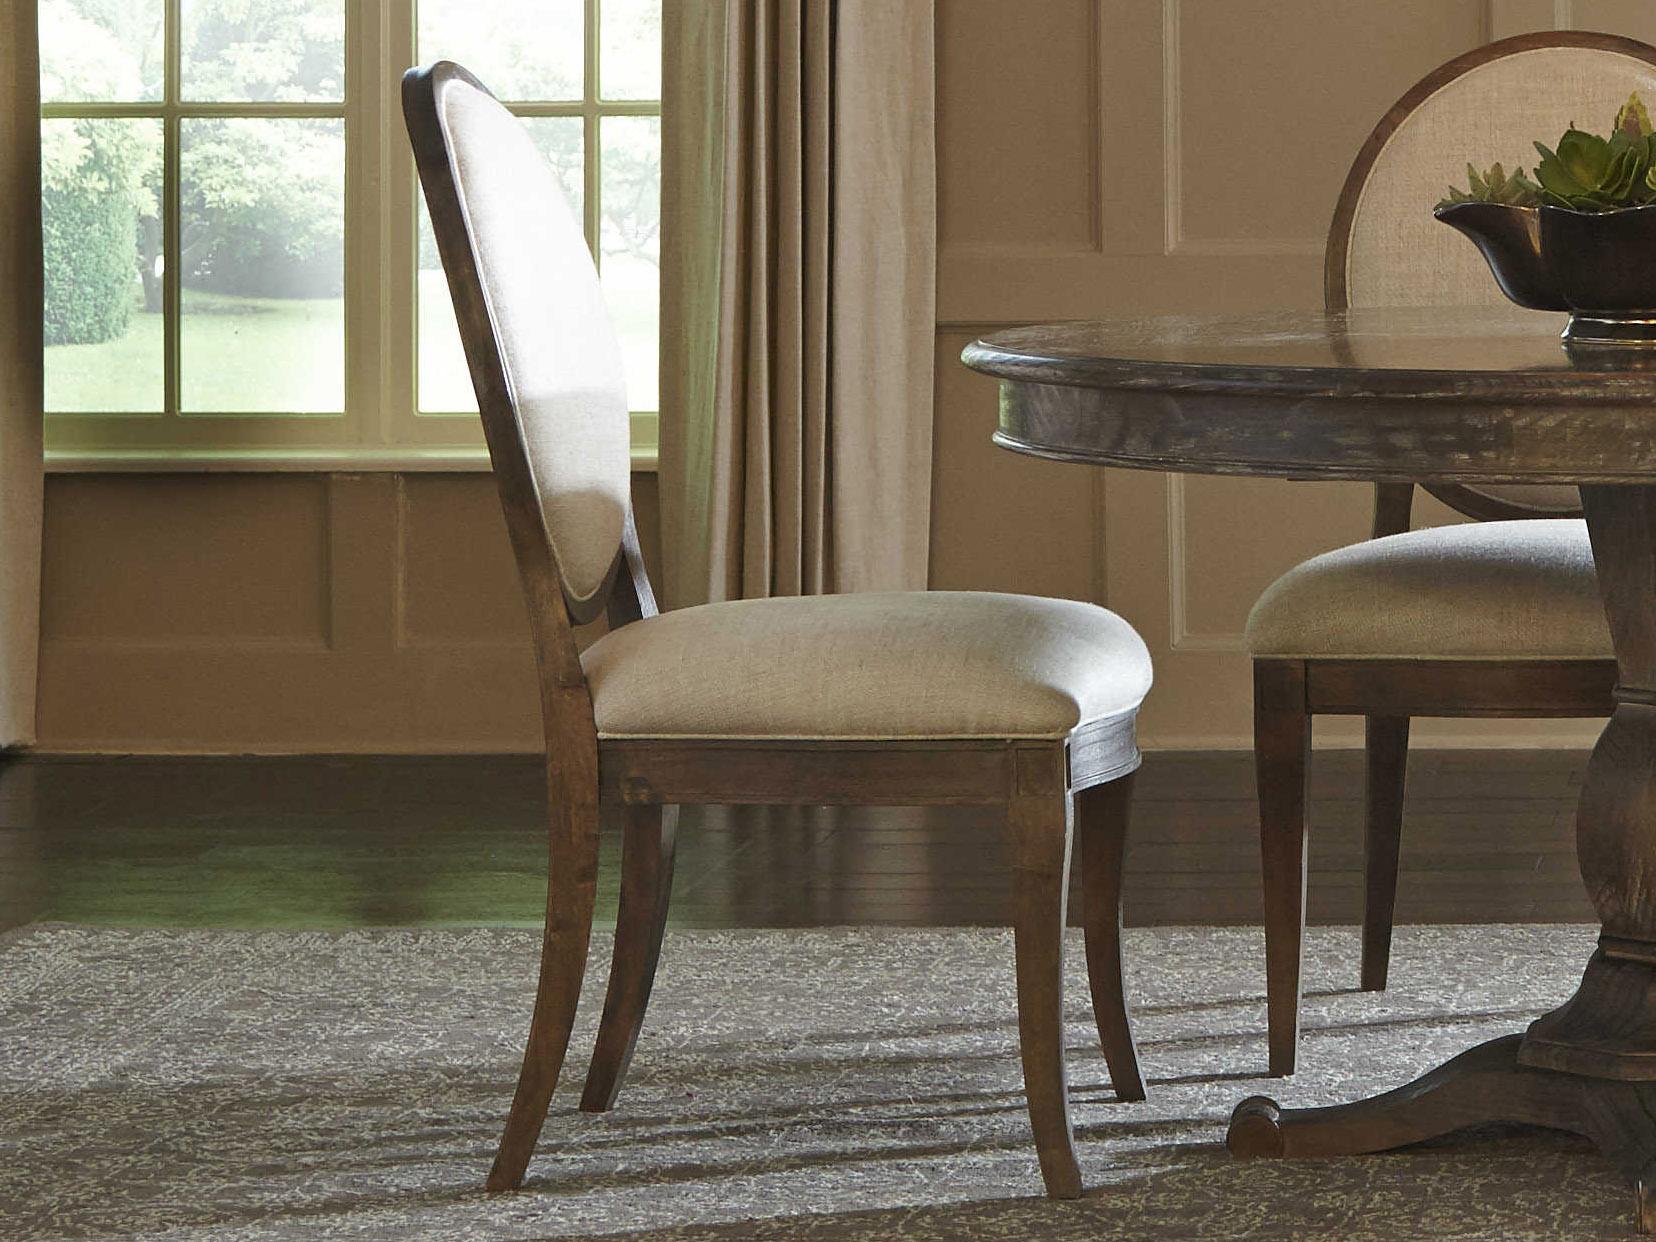 A R T Furniture Saint Germain Dining Set